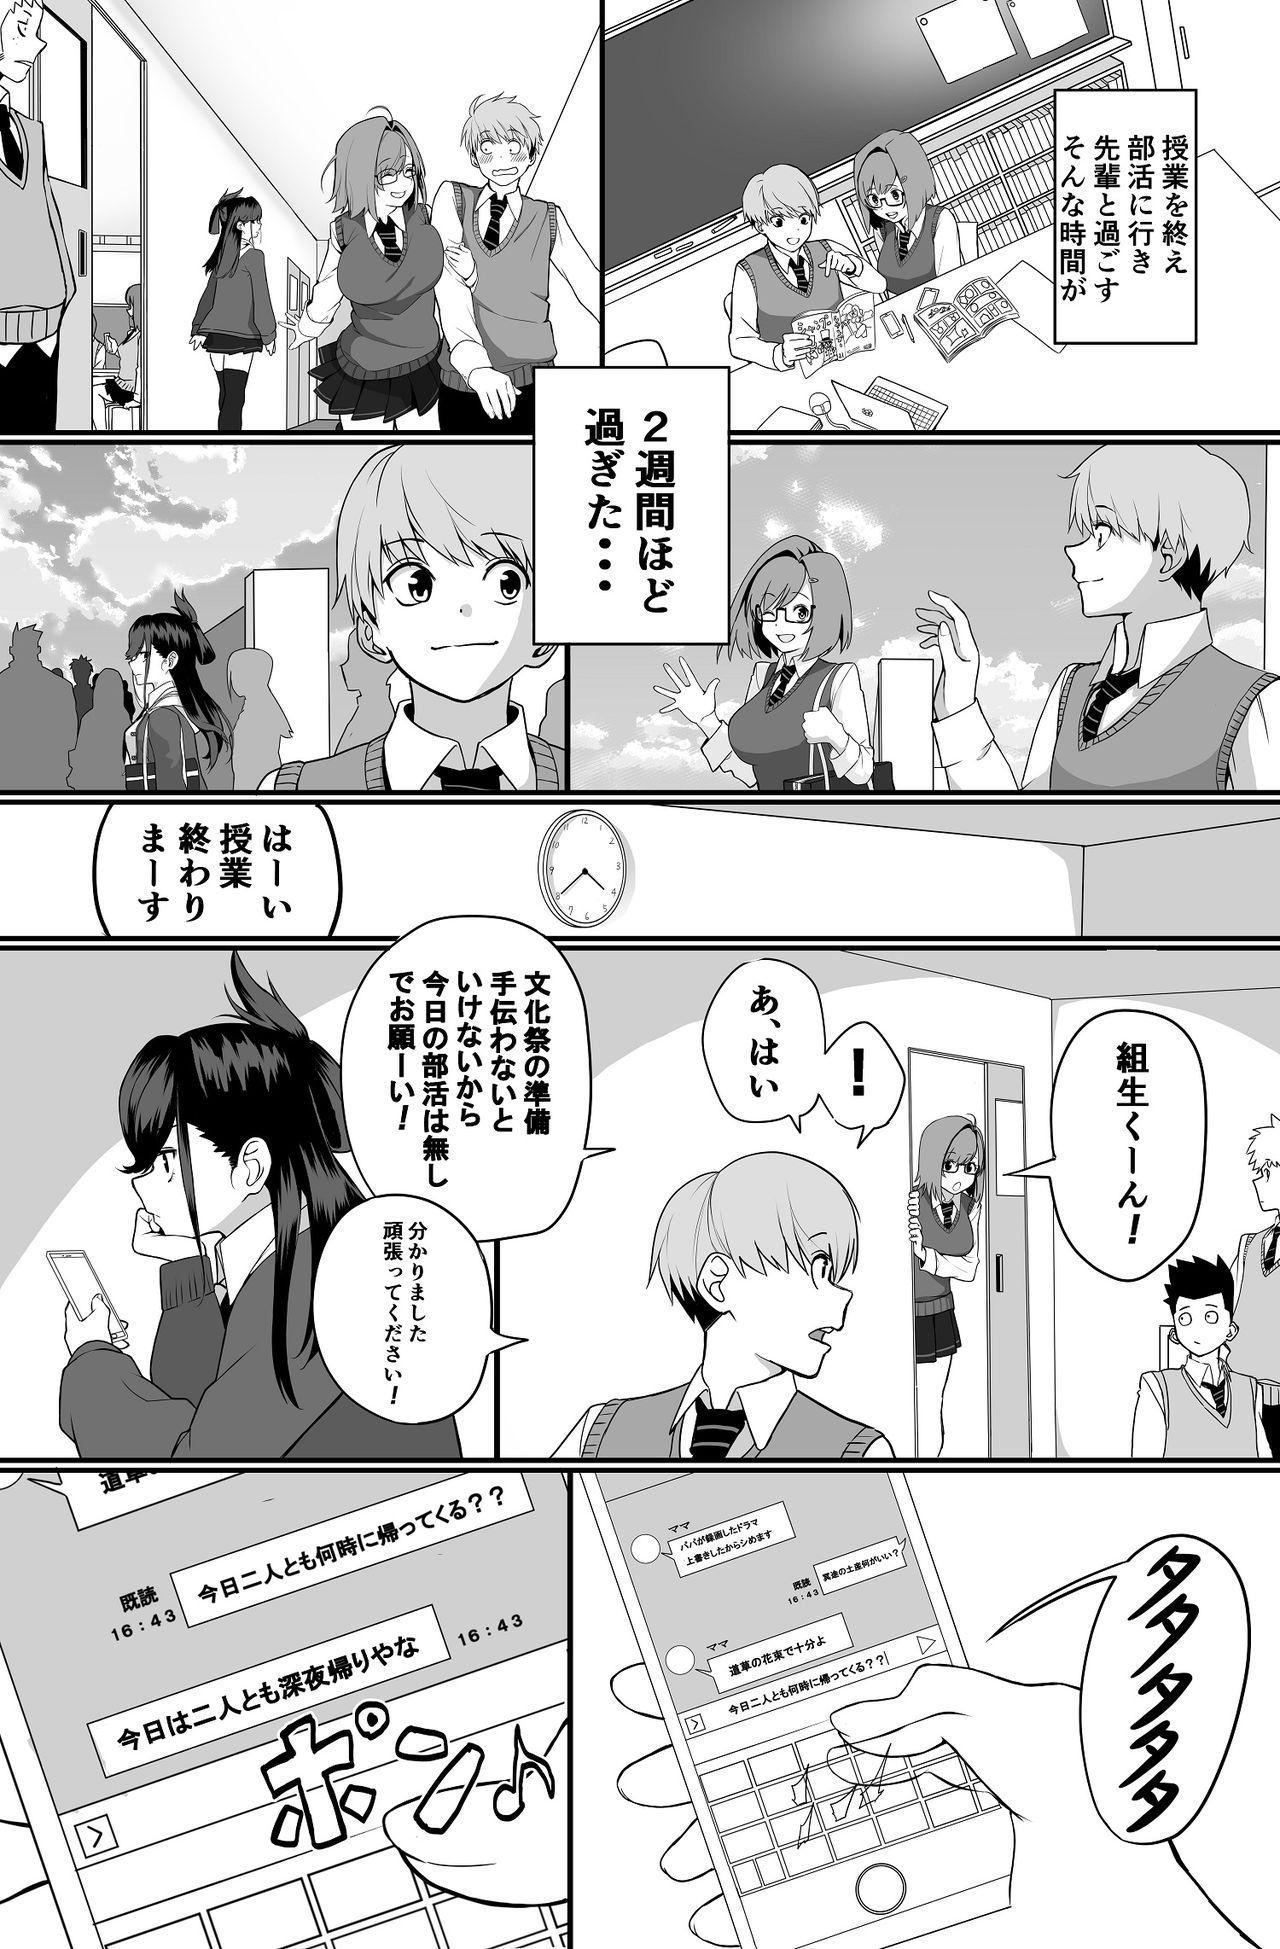 Itabasami na Wakachi Ai 7